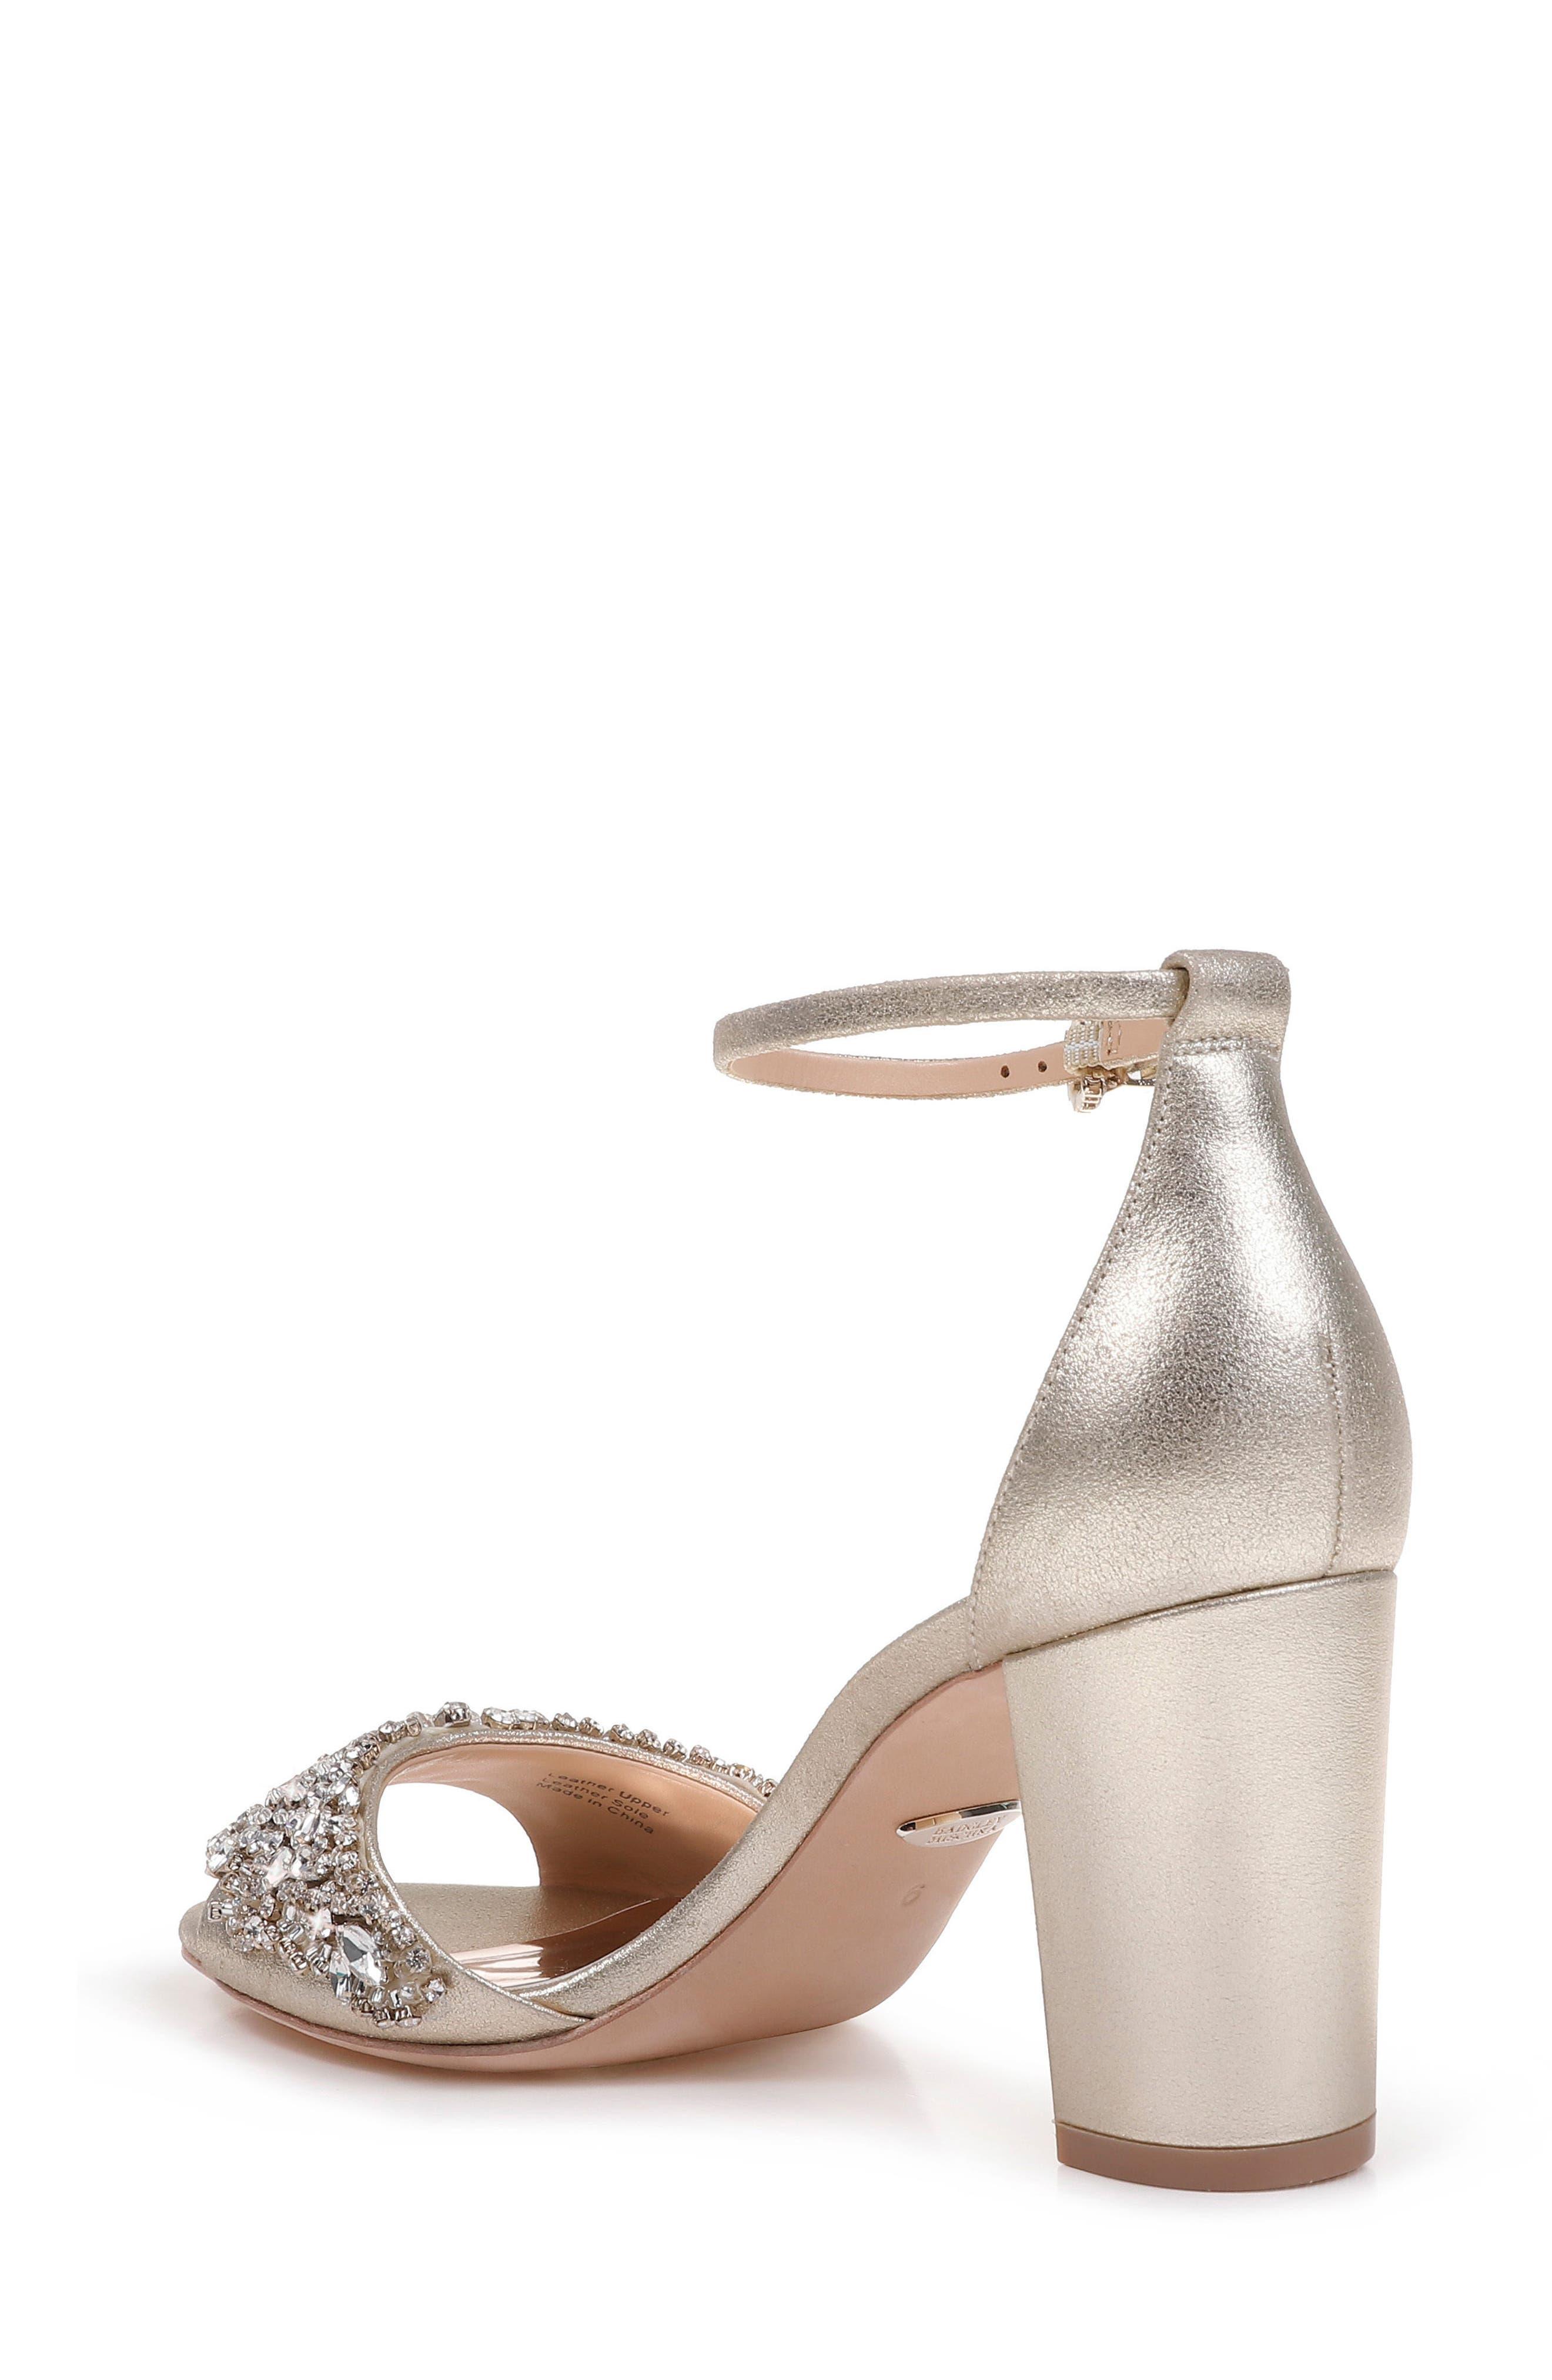 Hines Embellished Block Heel Sandal,                             Alternate thumbnail 6, color,